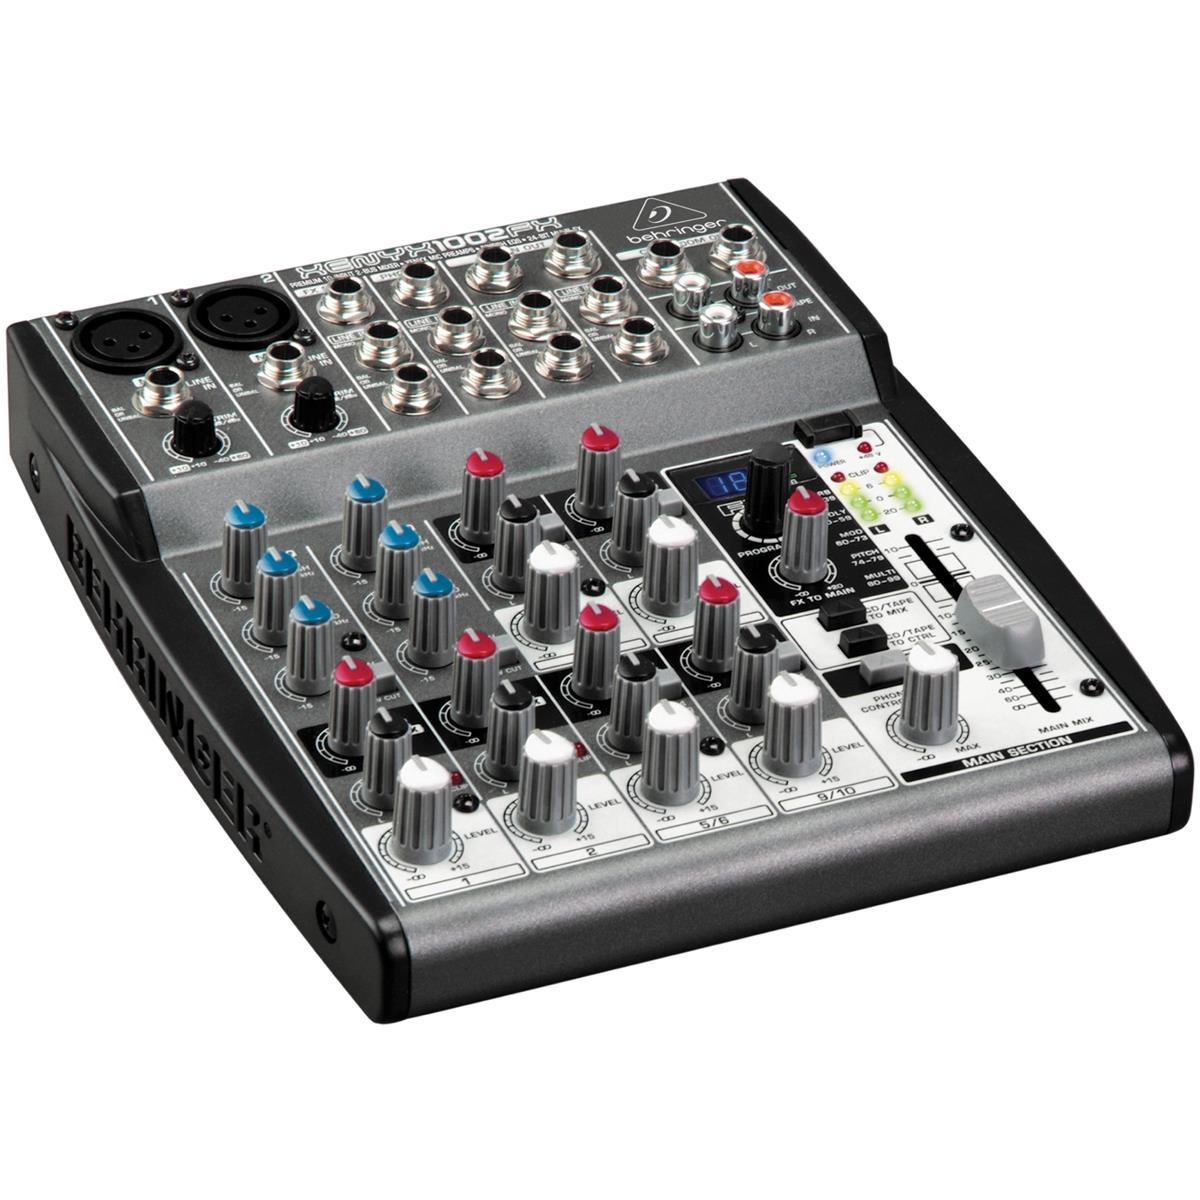 BEHRINGER-XENYX-1002-FX-MIXER-sku-1750